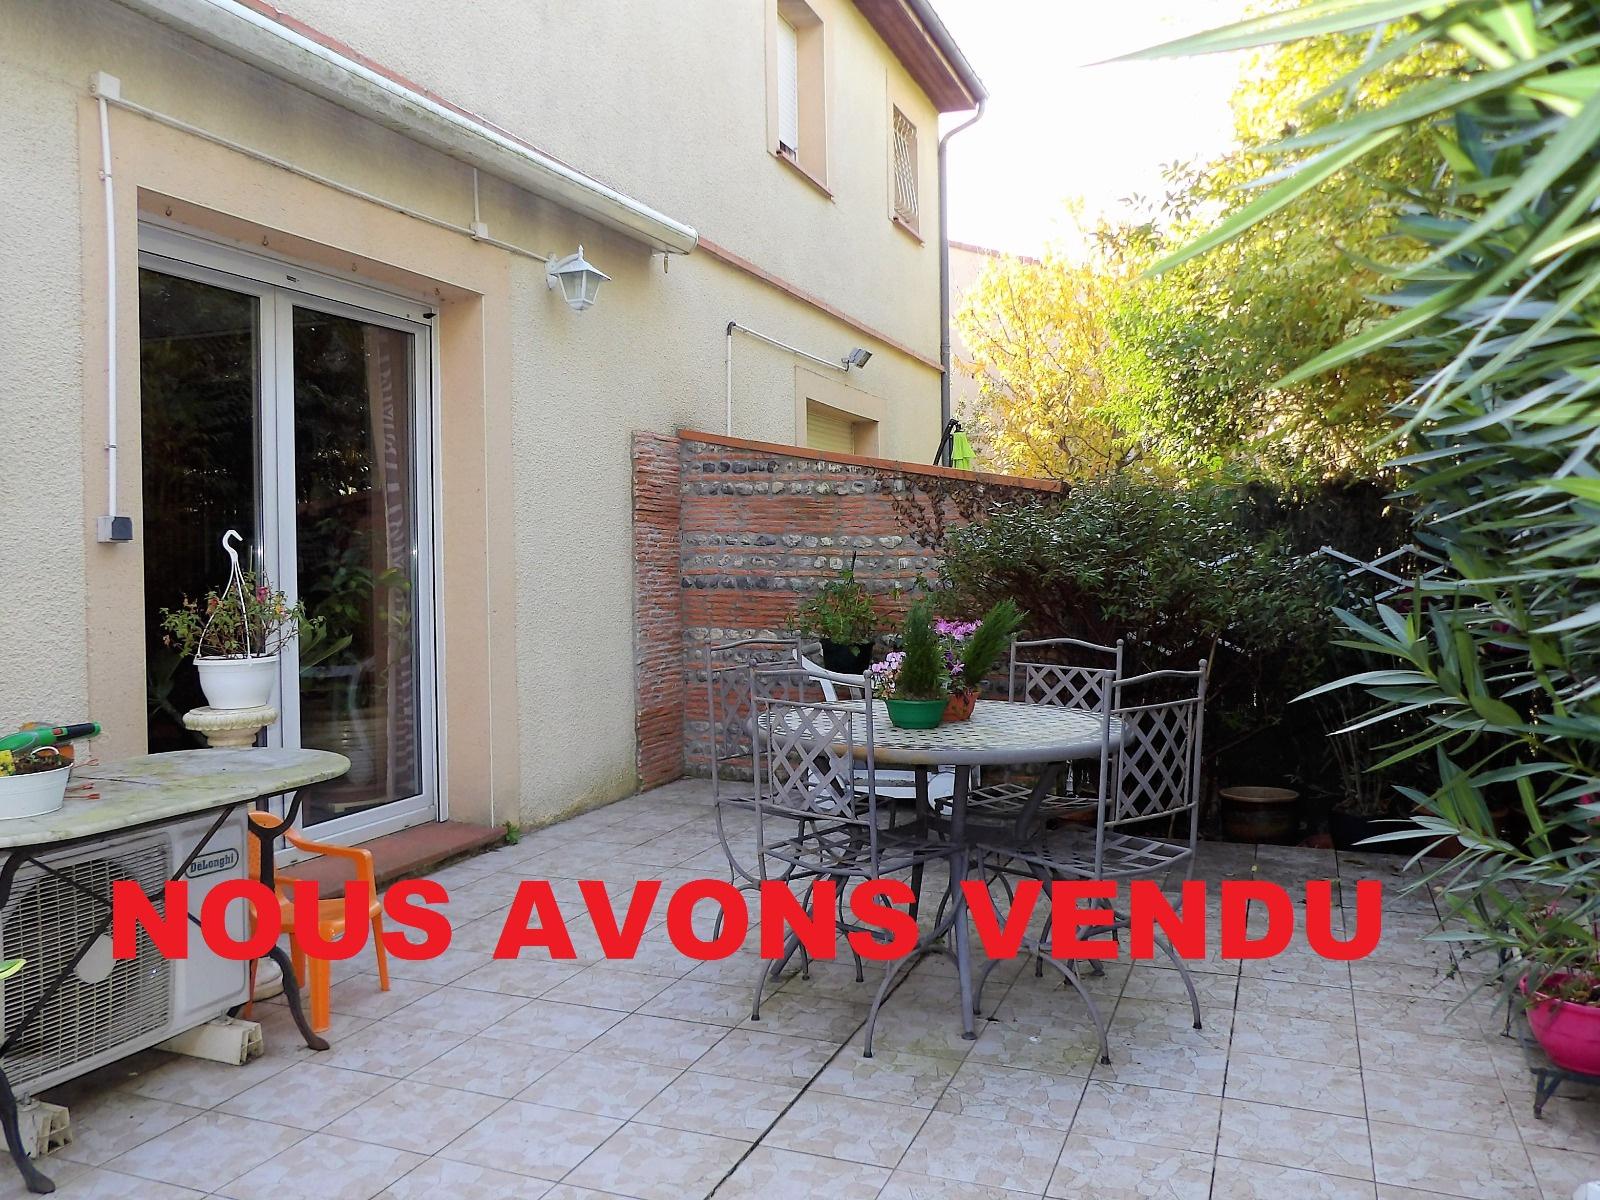 Kb immo 31 l 39 immobilier castanet tolosan vente et for Ca location immobilier